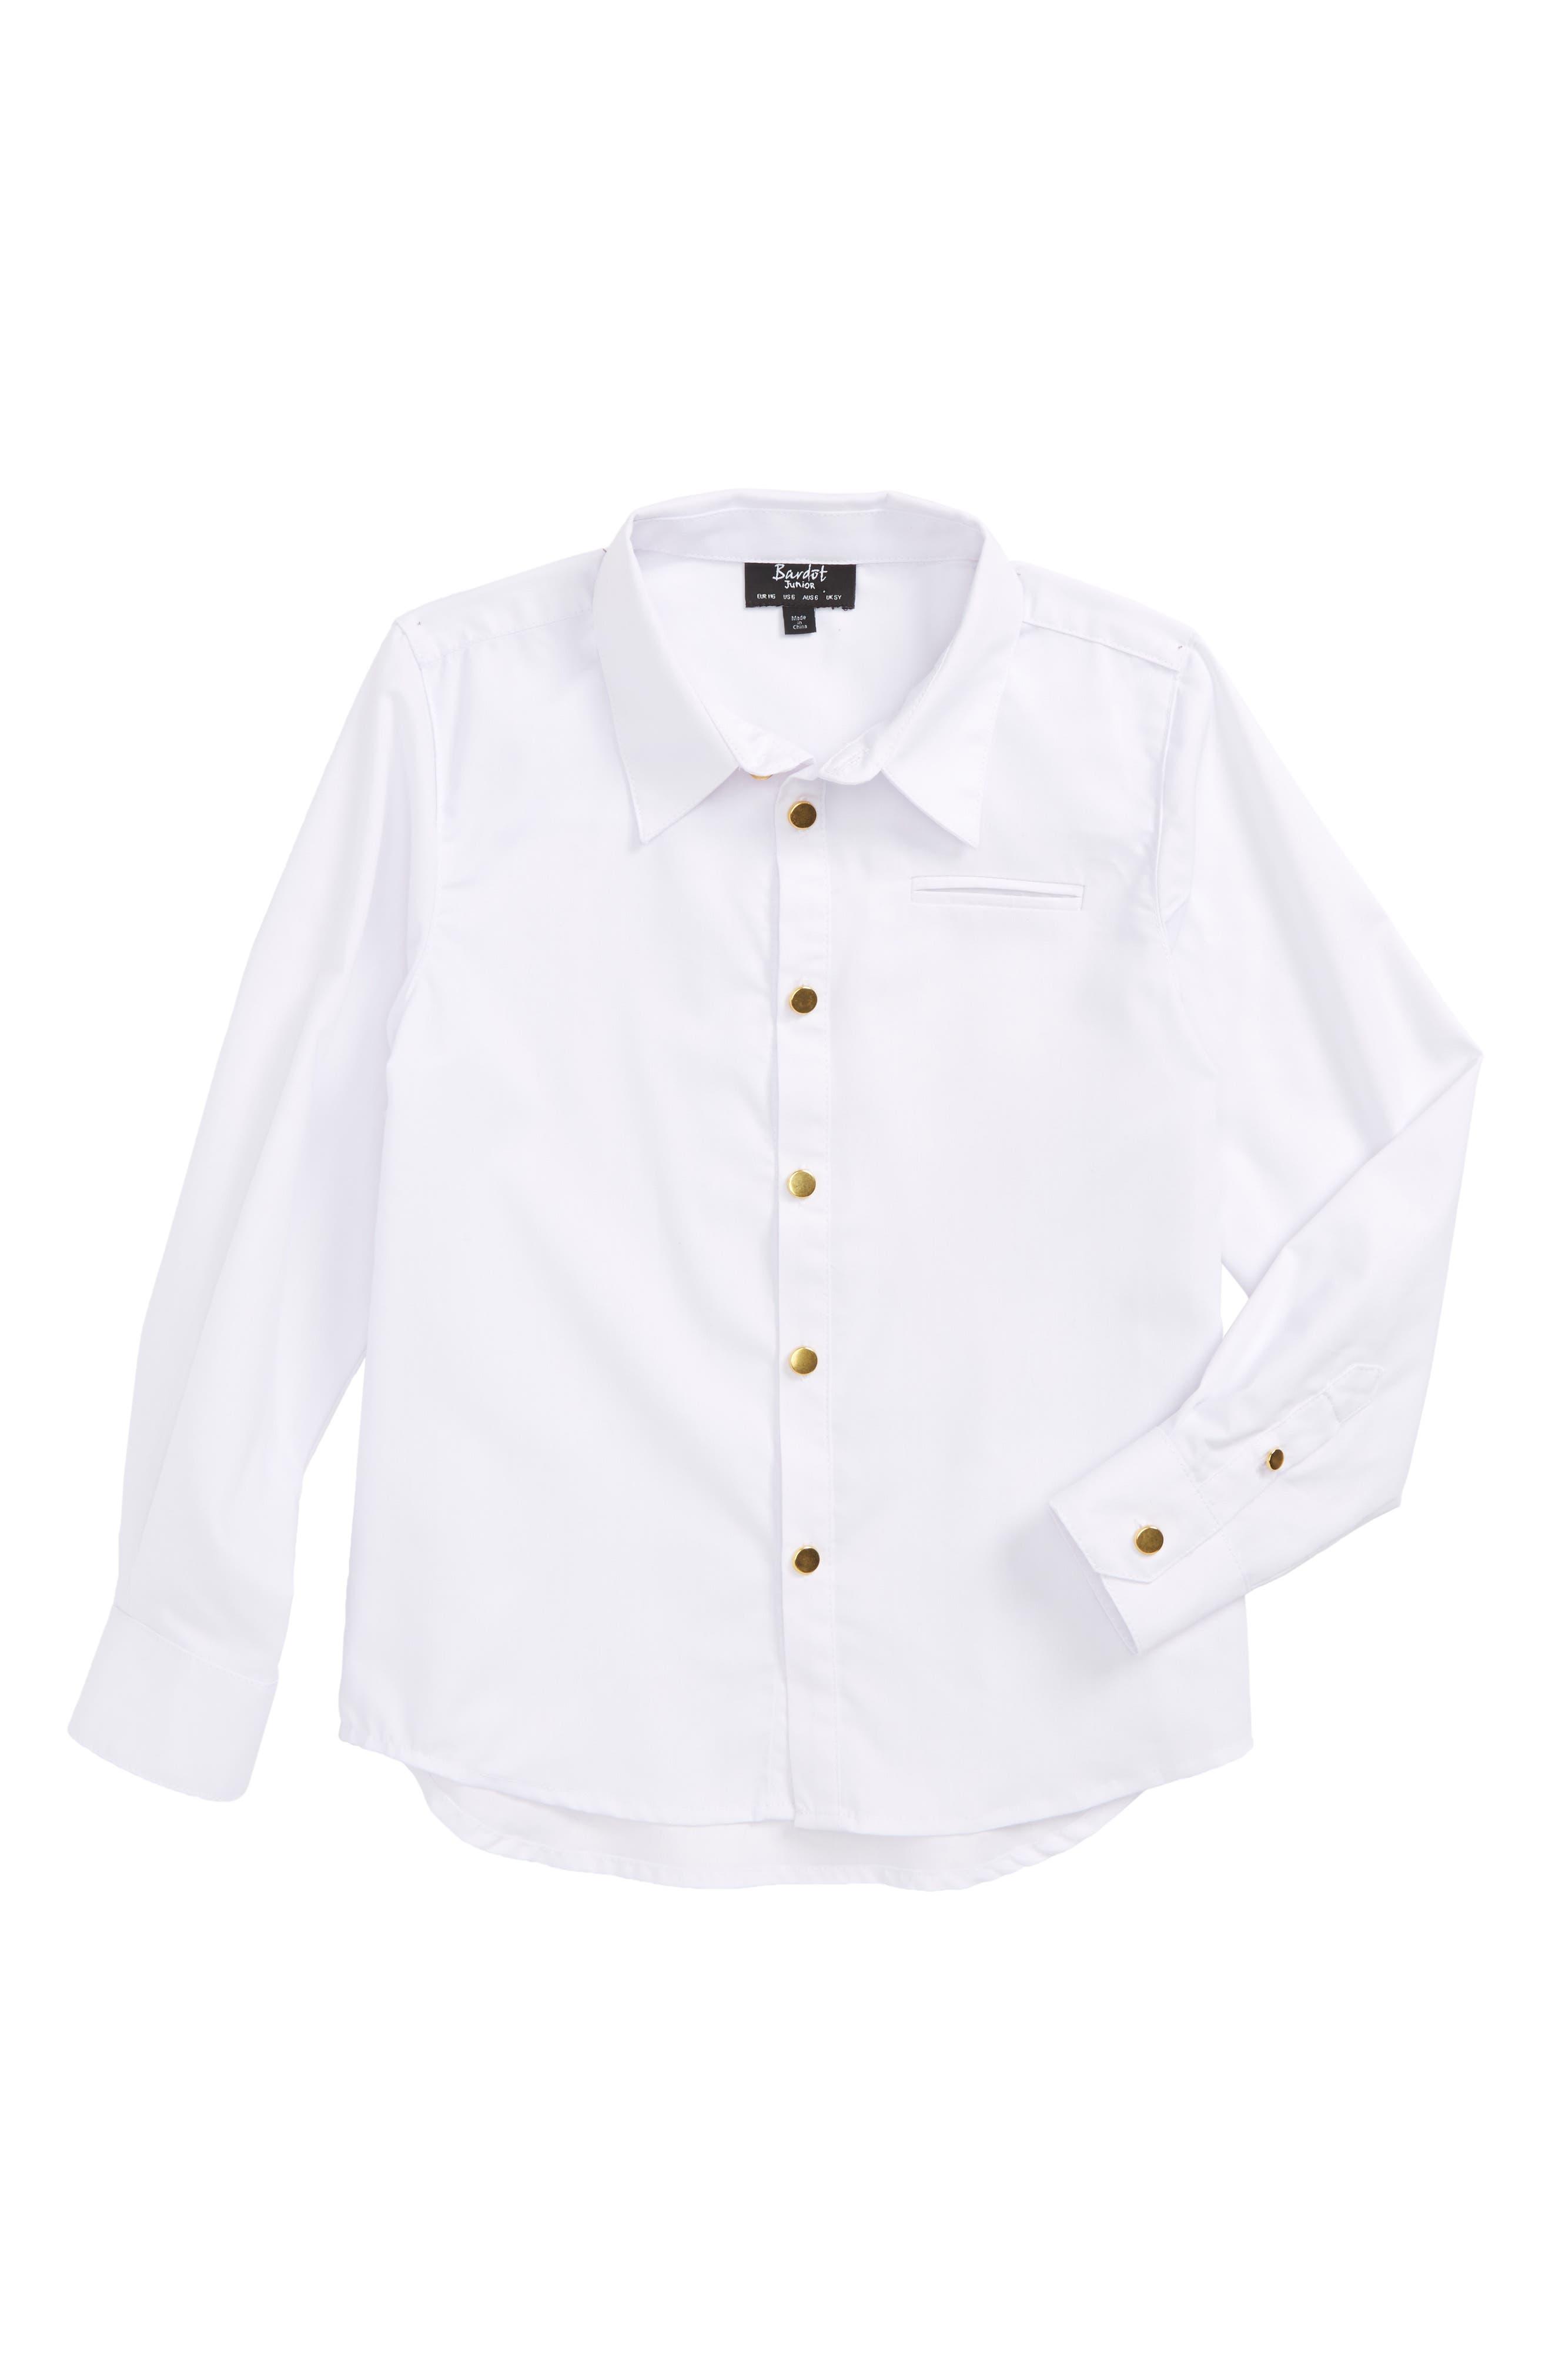 Alternate Image 1 Selected - Bardot Junior Goldtone Button Shirt (Toddler Boys & Little Boys)